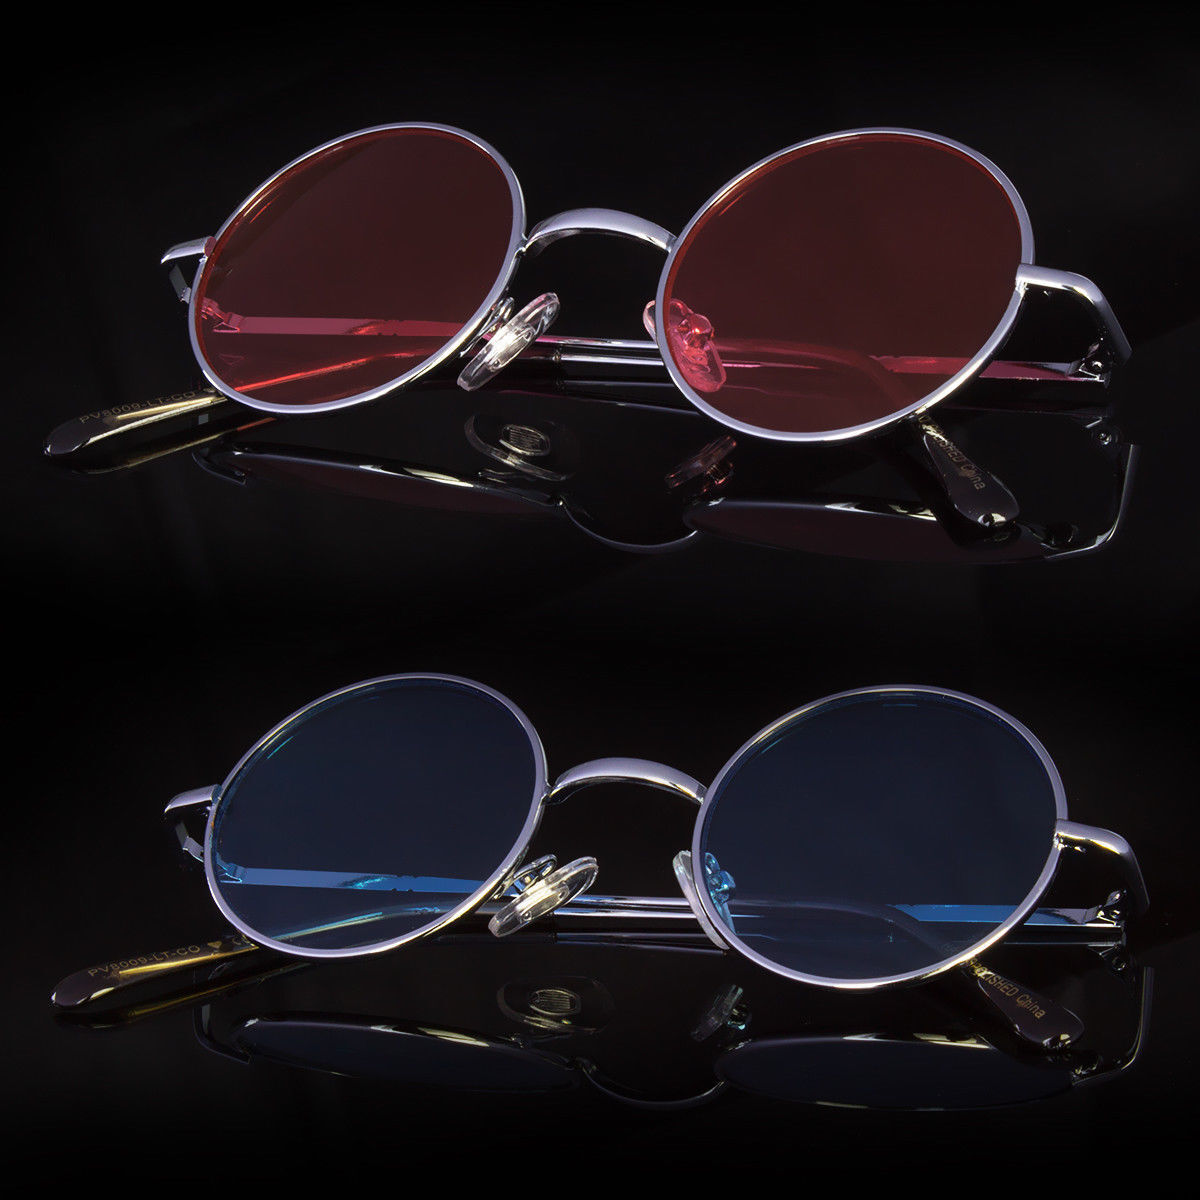 john lennon style sunglasses round retro vintage